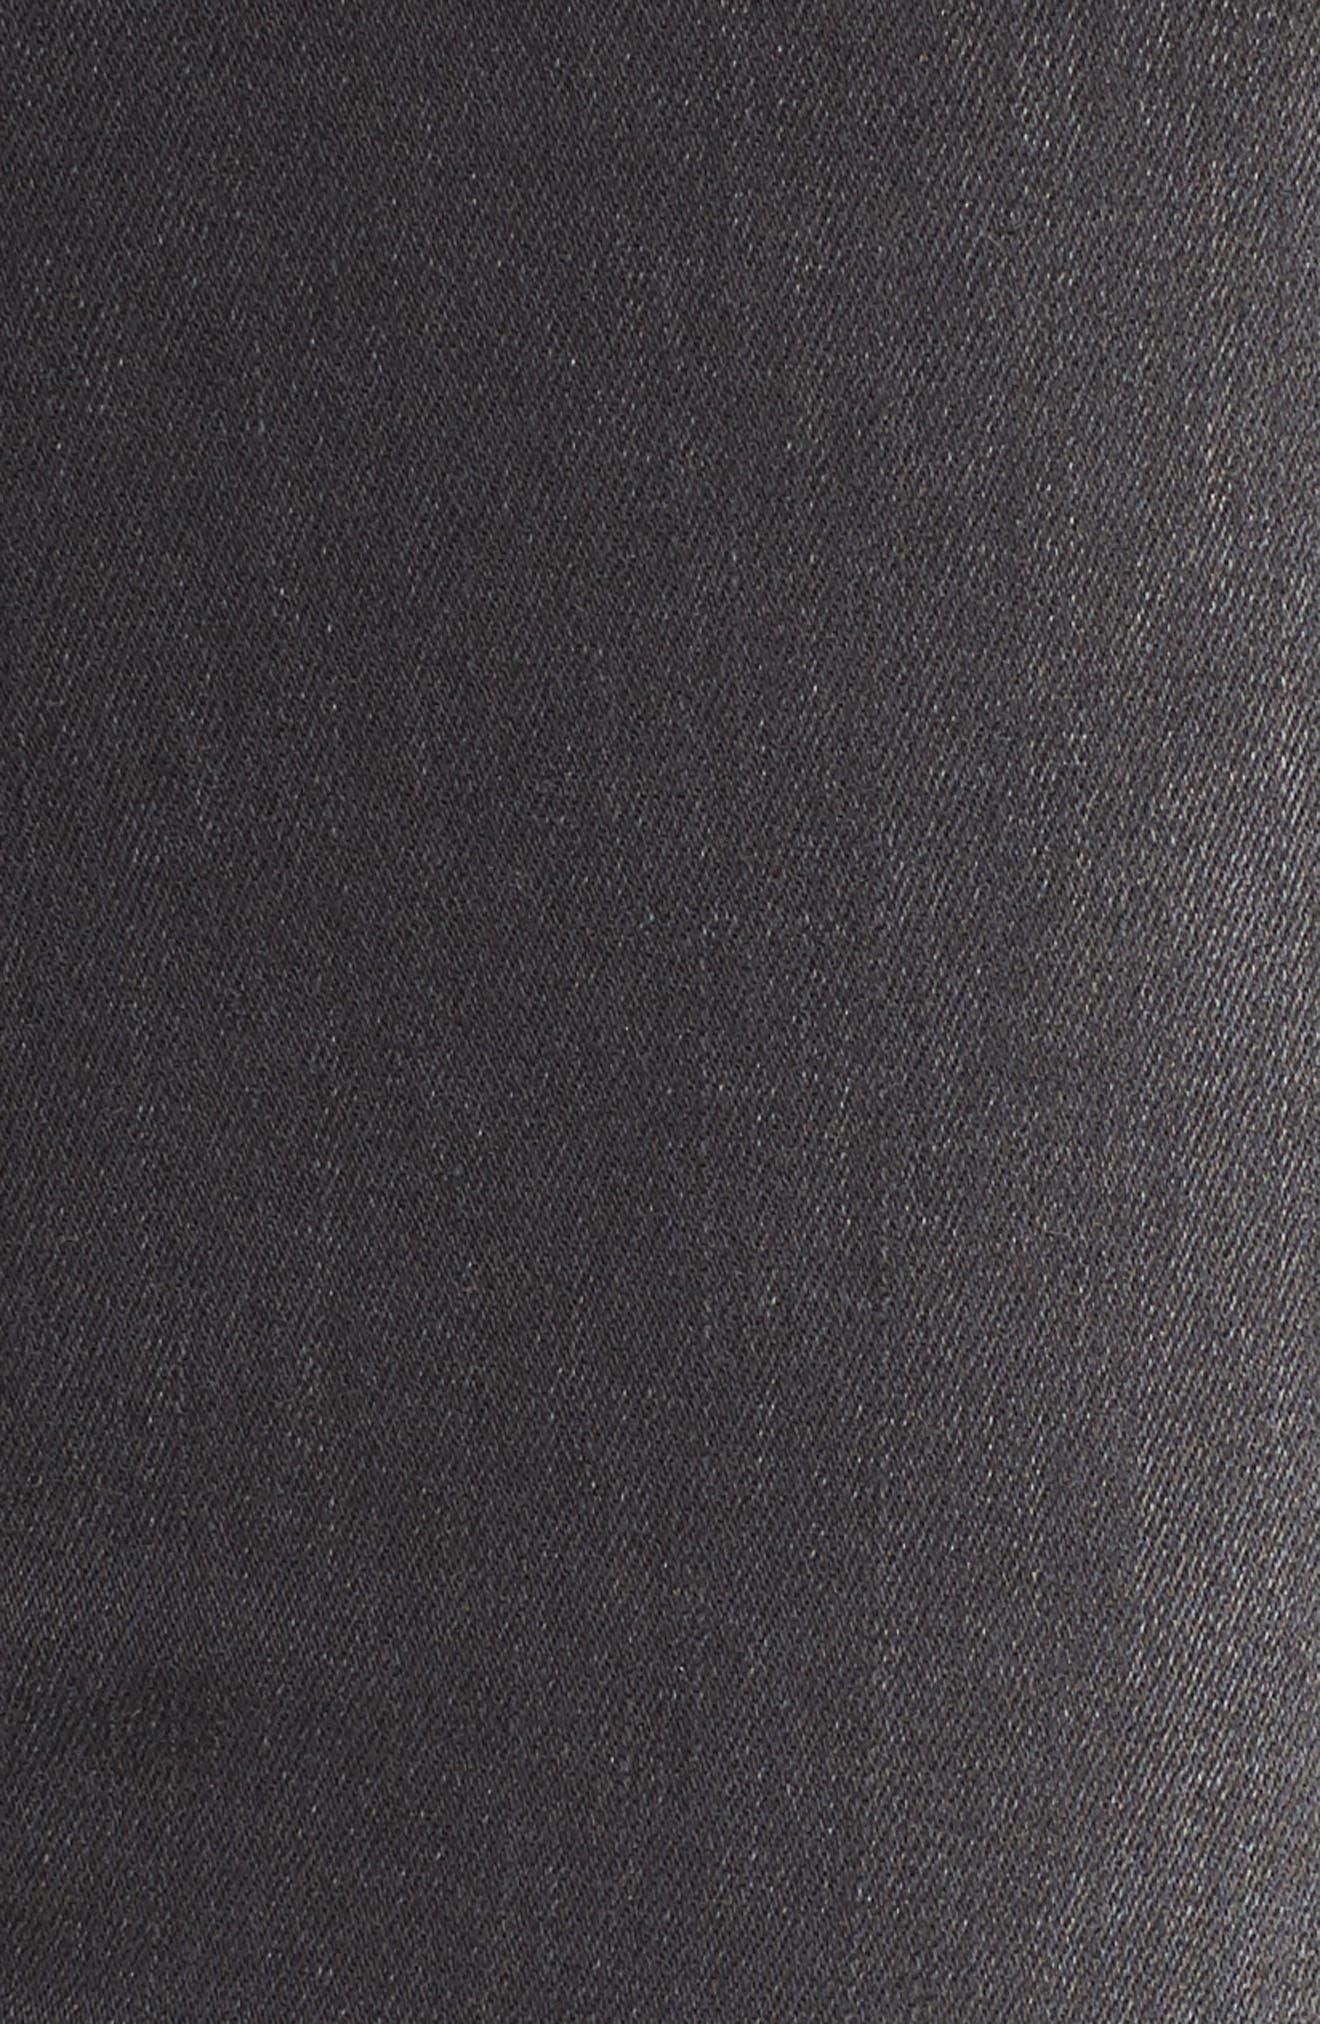 Embellished Ripped Skinny Jeans,                             Alternate thumbnail 6, color,                             Vivaldi